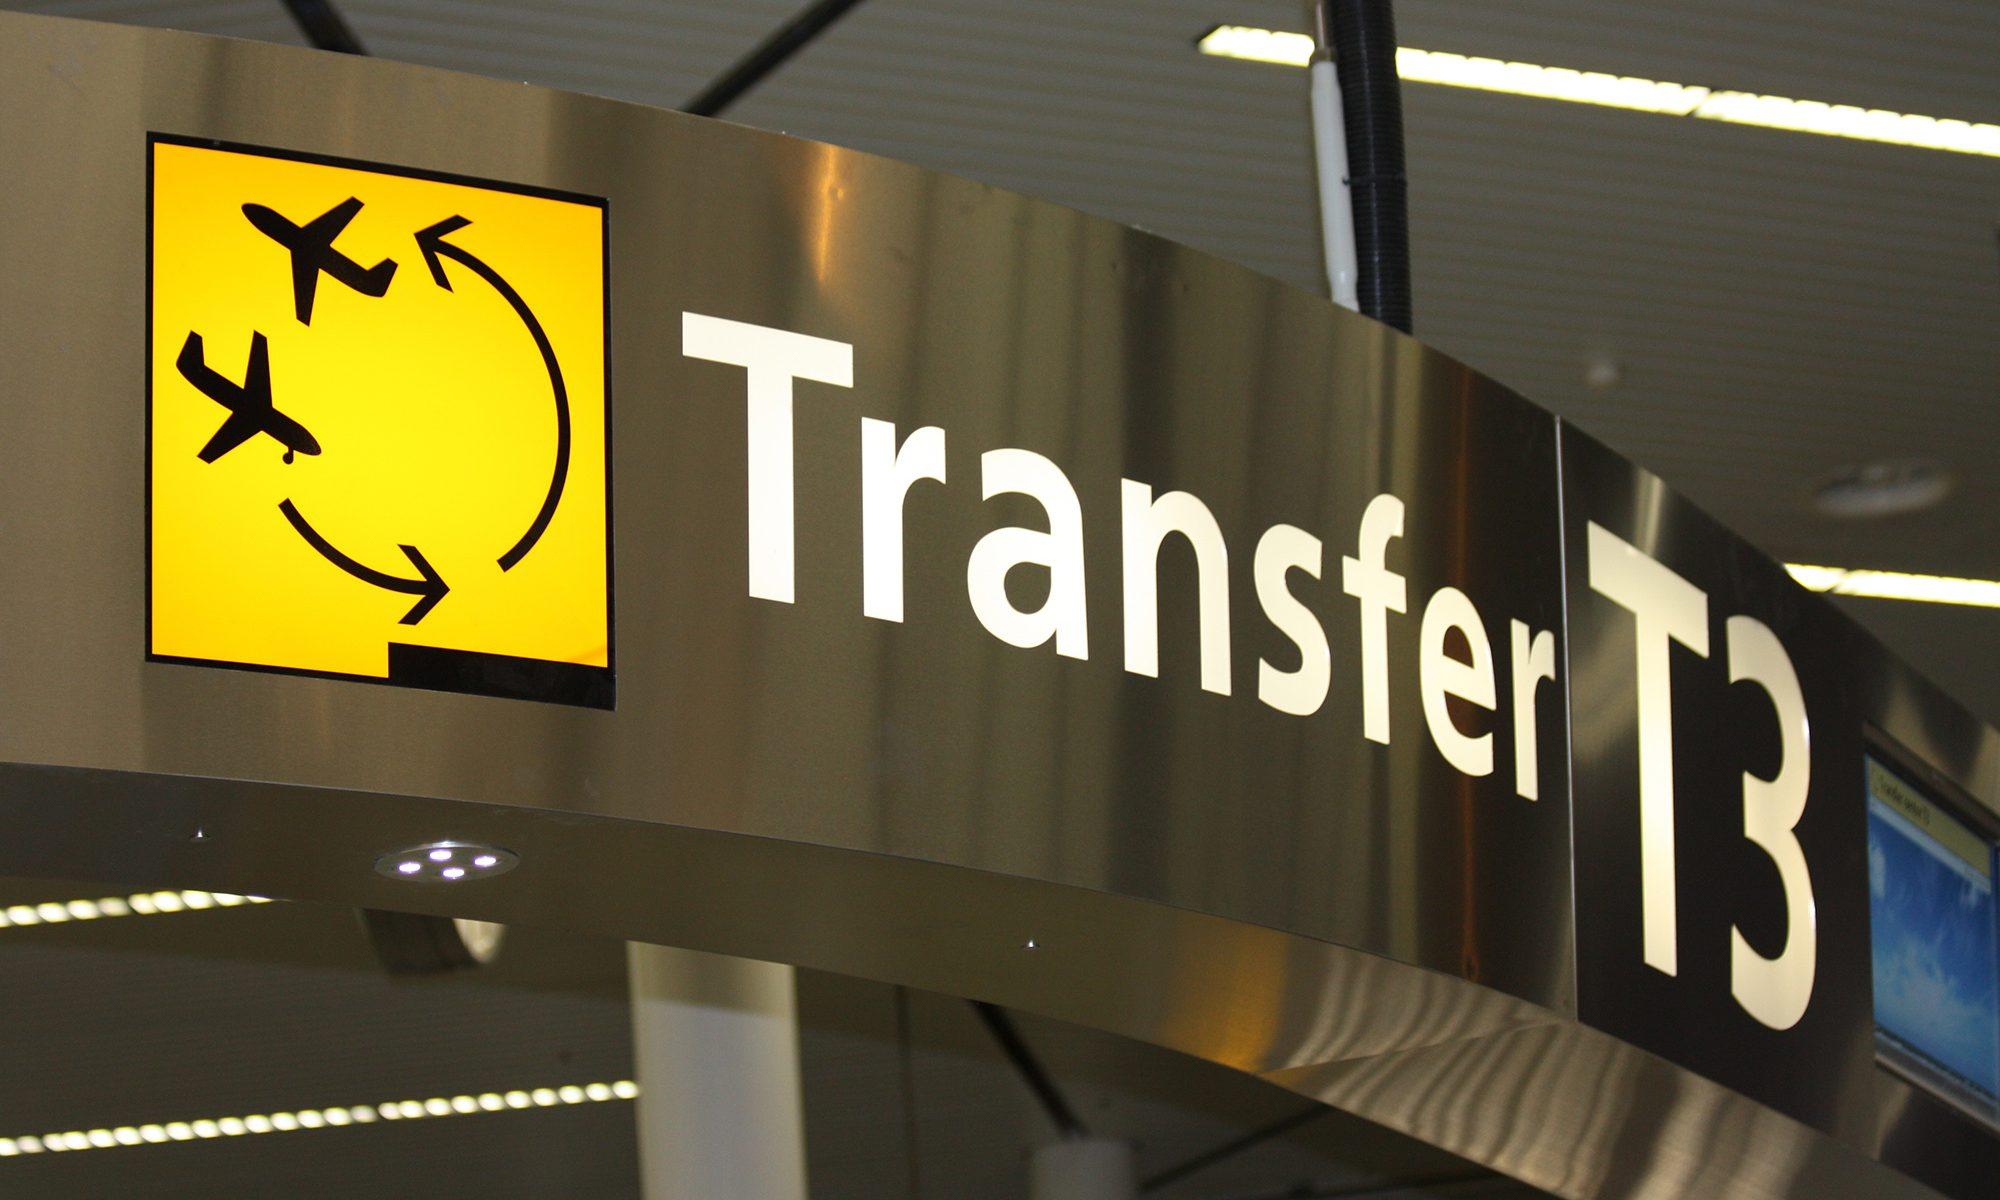 Penerbangan Transit bisa jadi pilihan